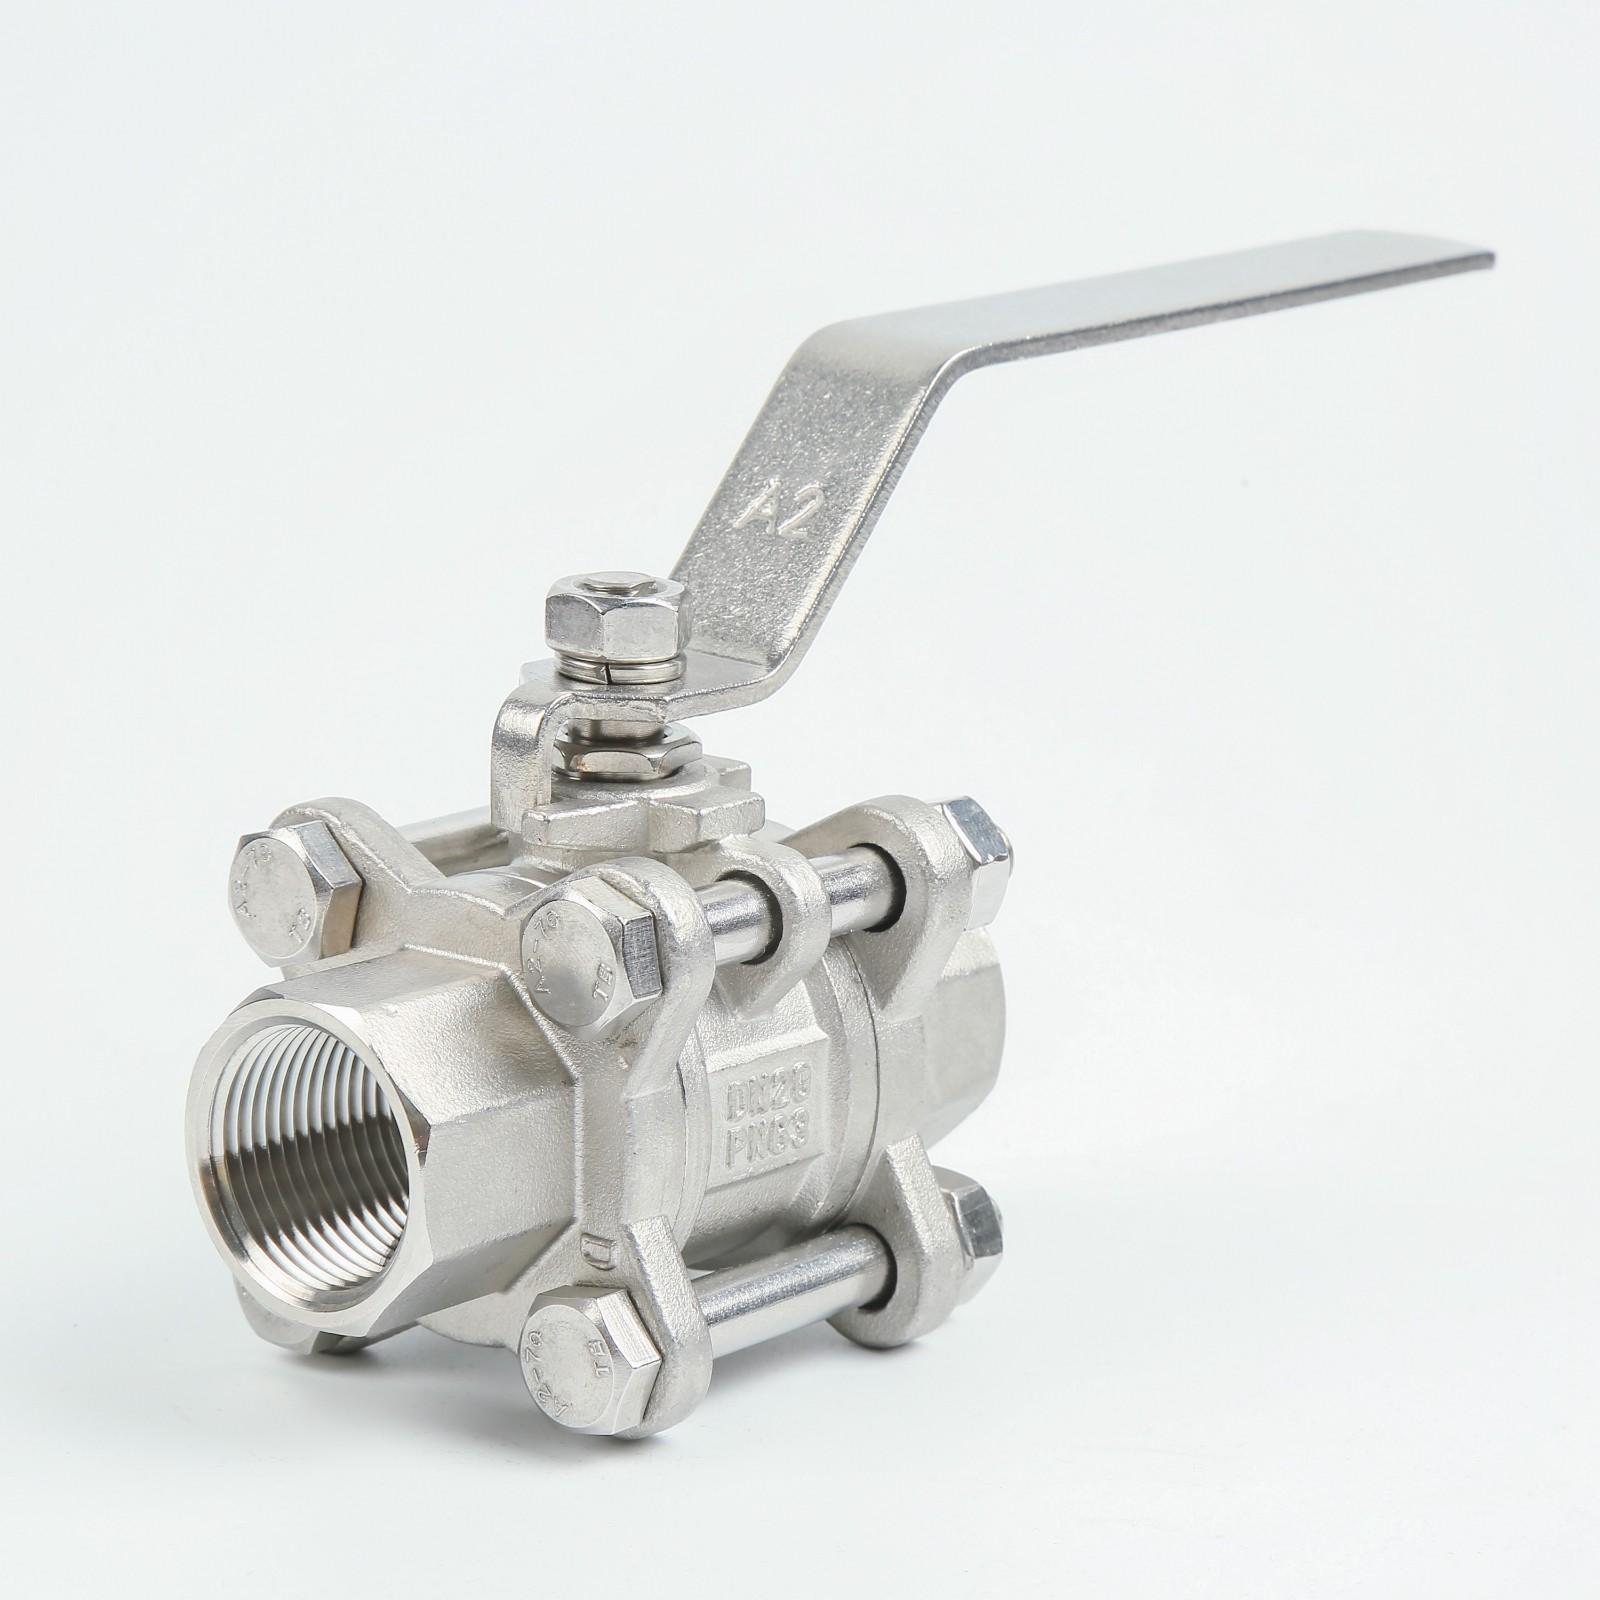 Stainless steel 3pc ball valve